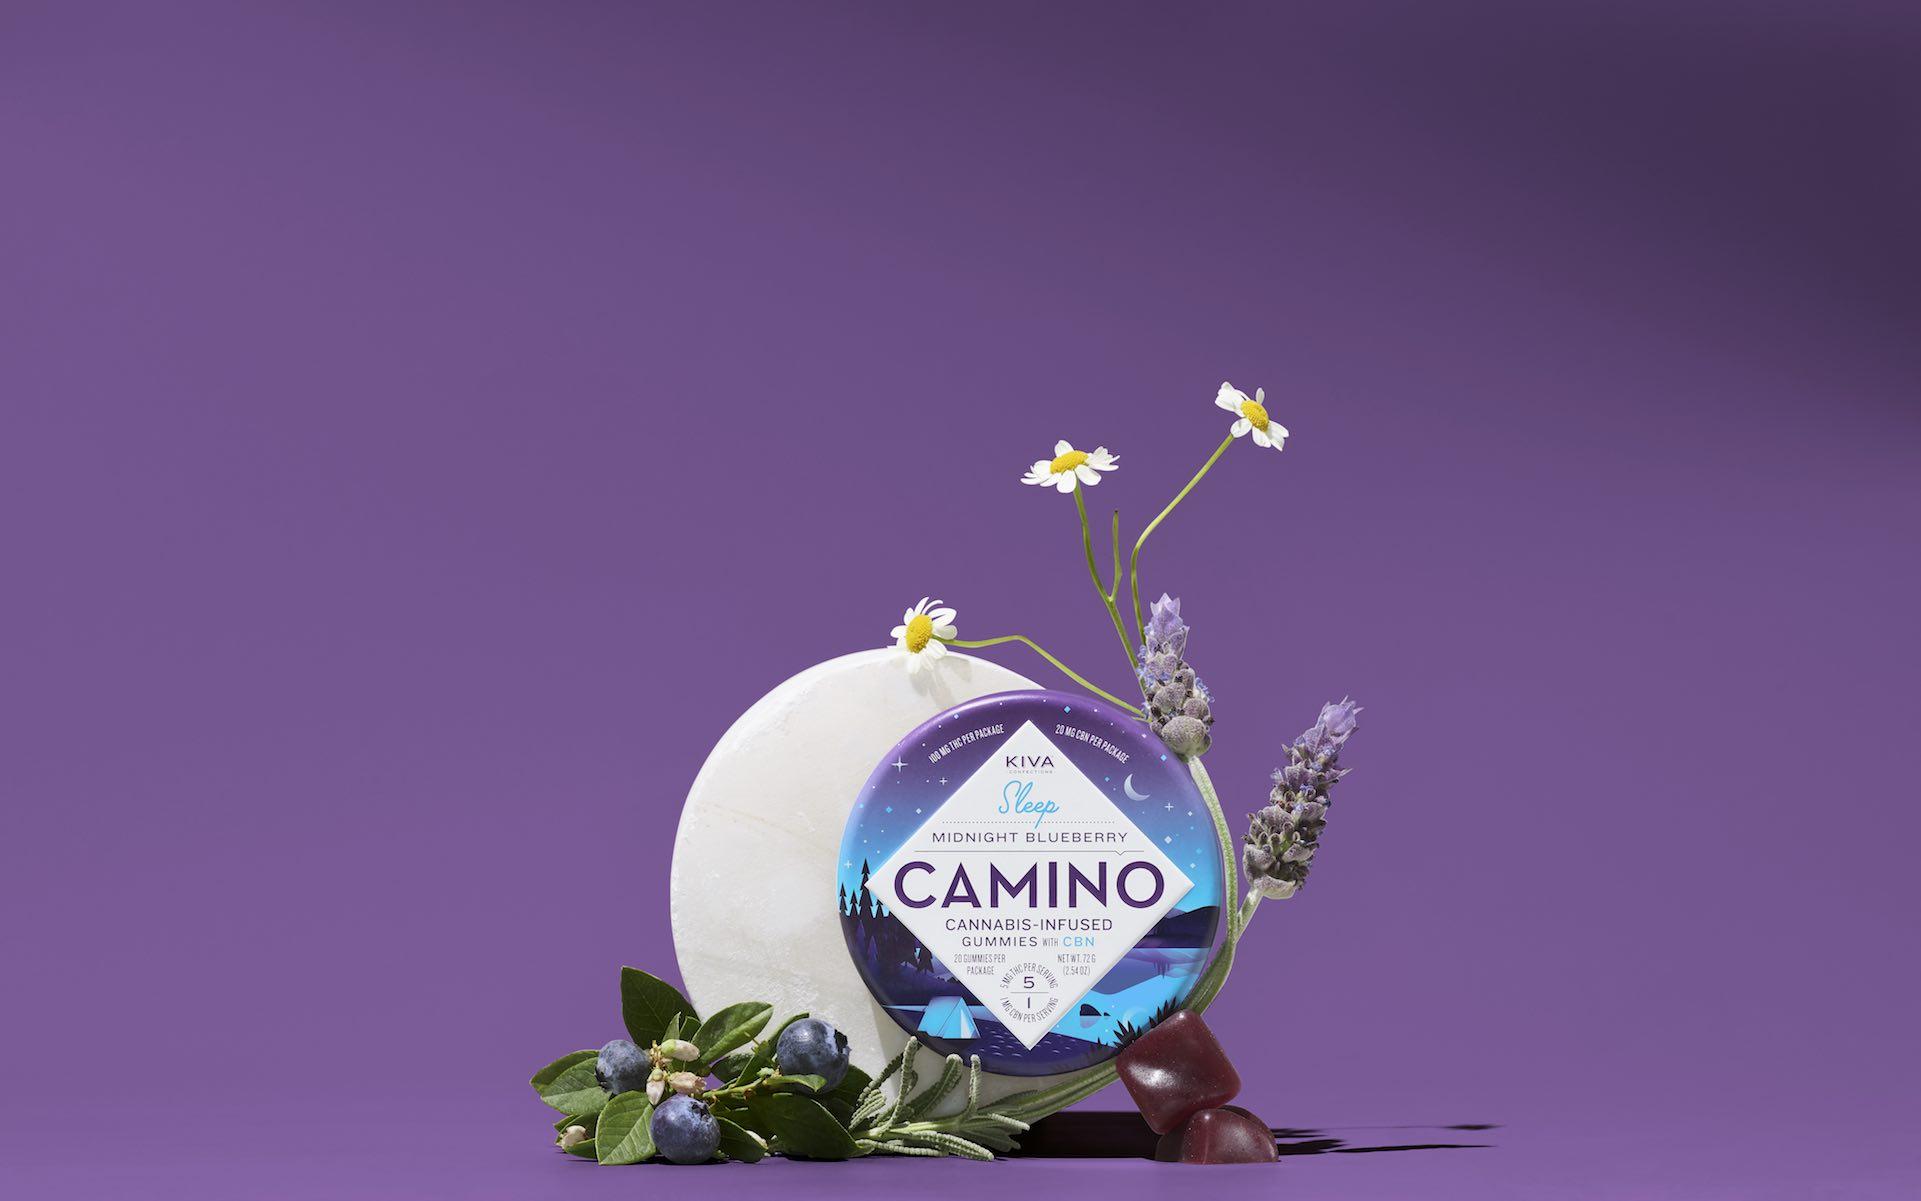 Kiva's Camino gummies are the hot Mother's Day item for California 2020. (Kiva)